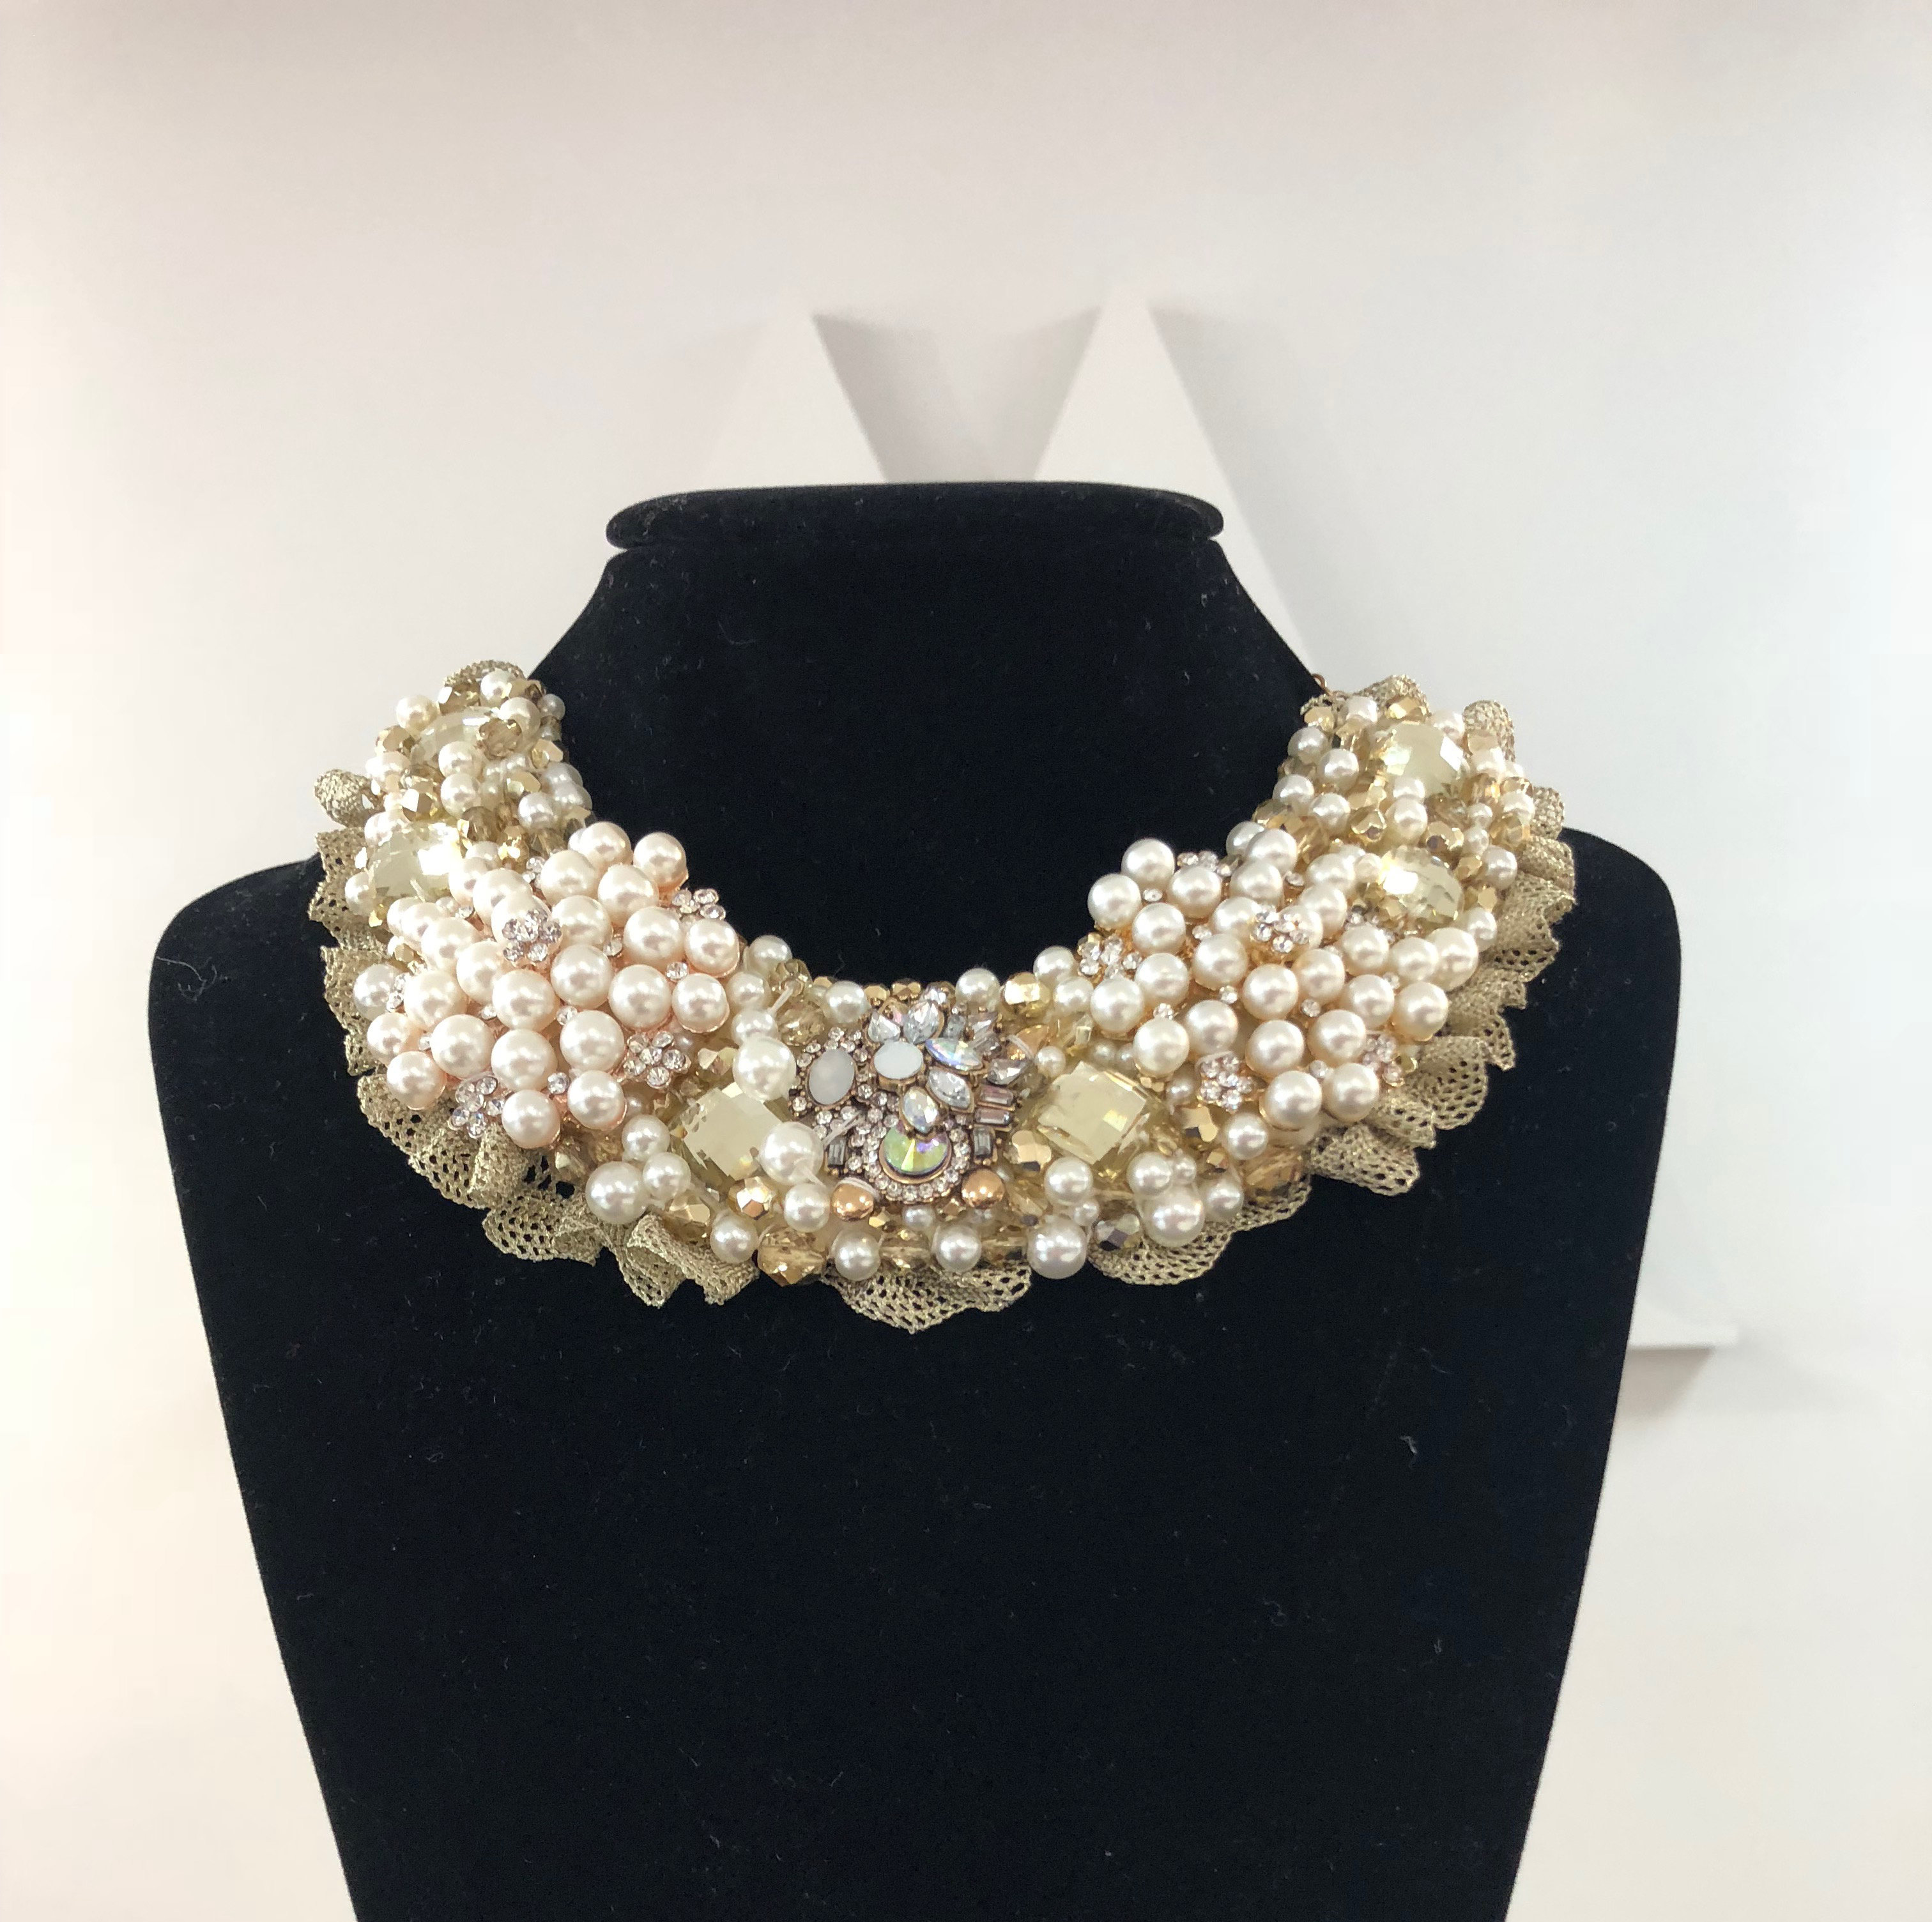 Aisling Maher Collar pearl/gold/bling YHMDZJ57GJQ70